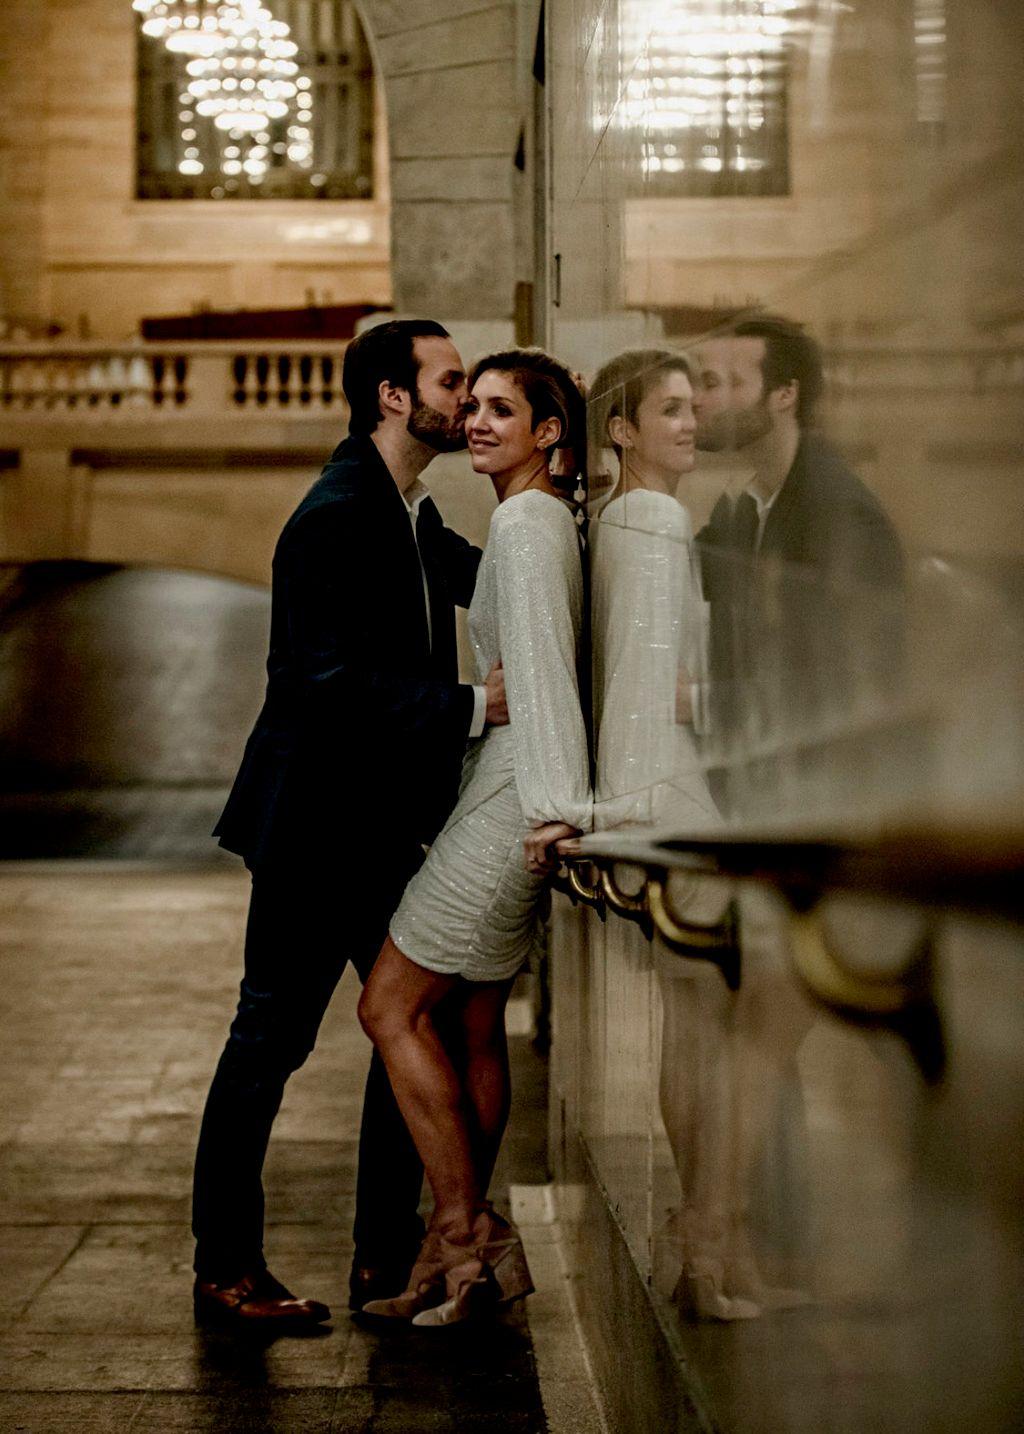 Engagement Photography - New York 2020